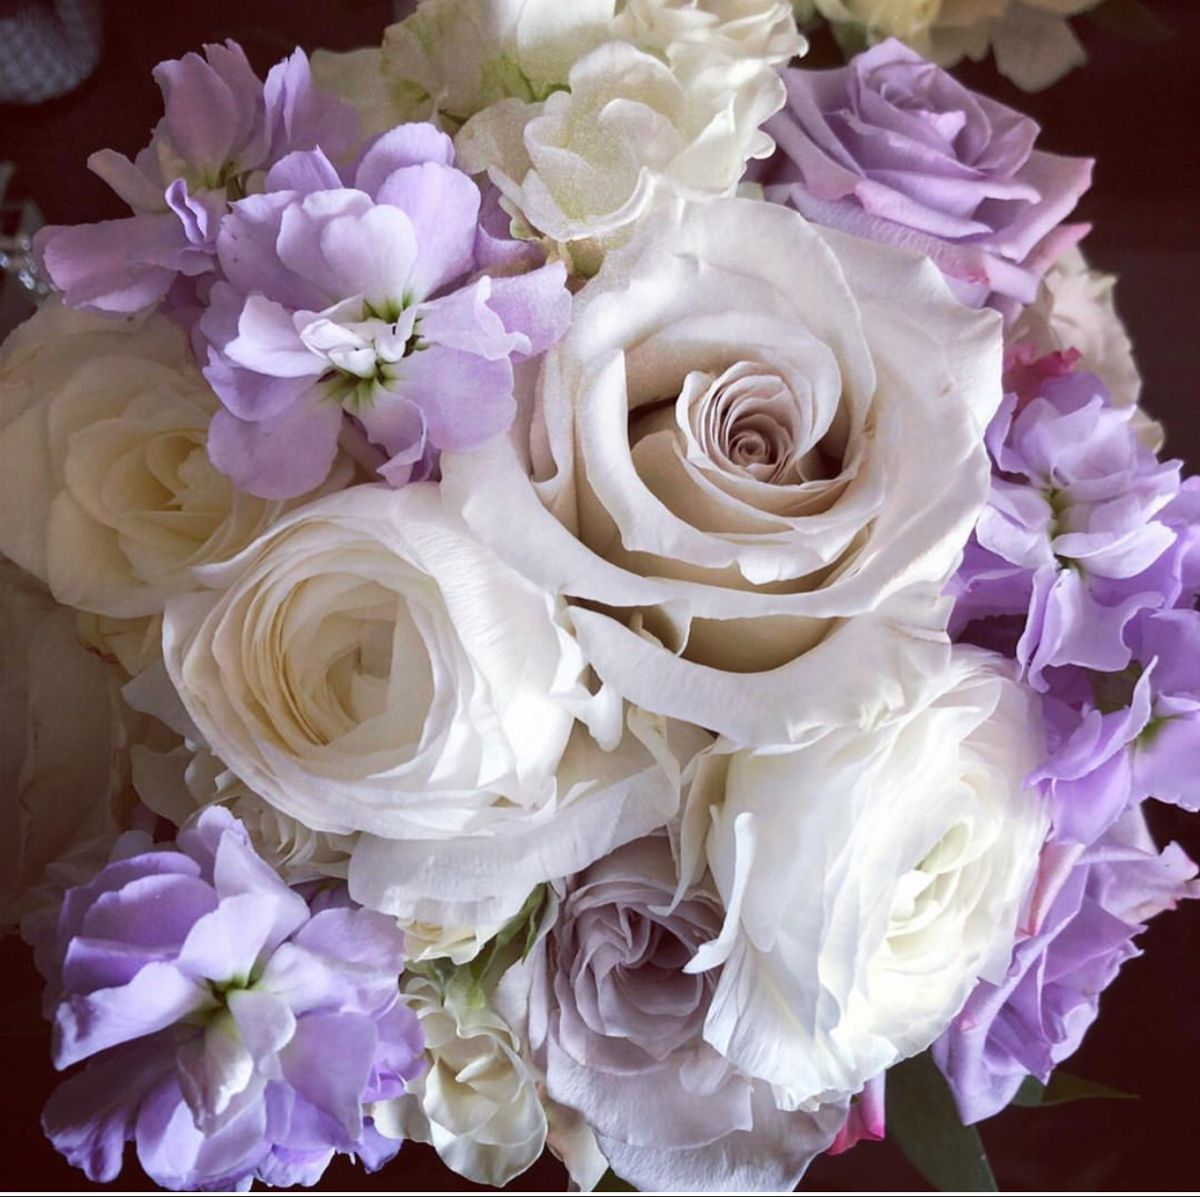 Bicolor Lavender Colored Flowers In 2020 Flowers Purple Flowers Wholesale Flowers